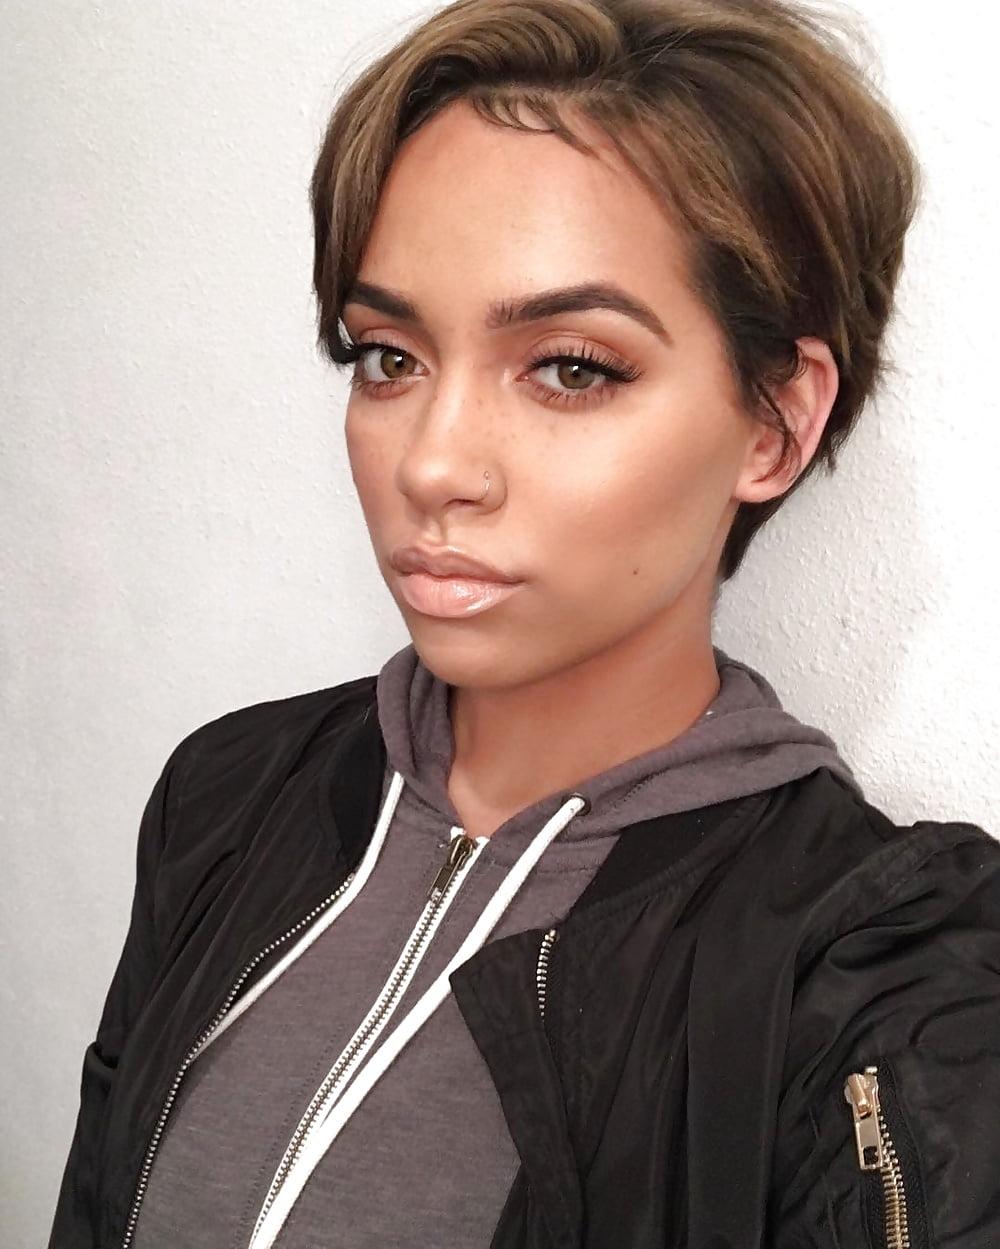 Mohawk black girl hairstyles-2423